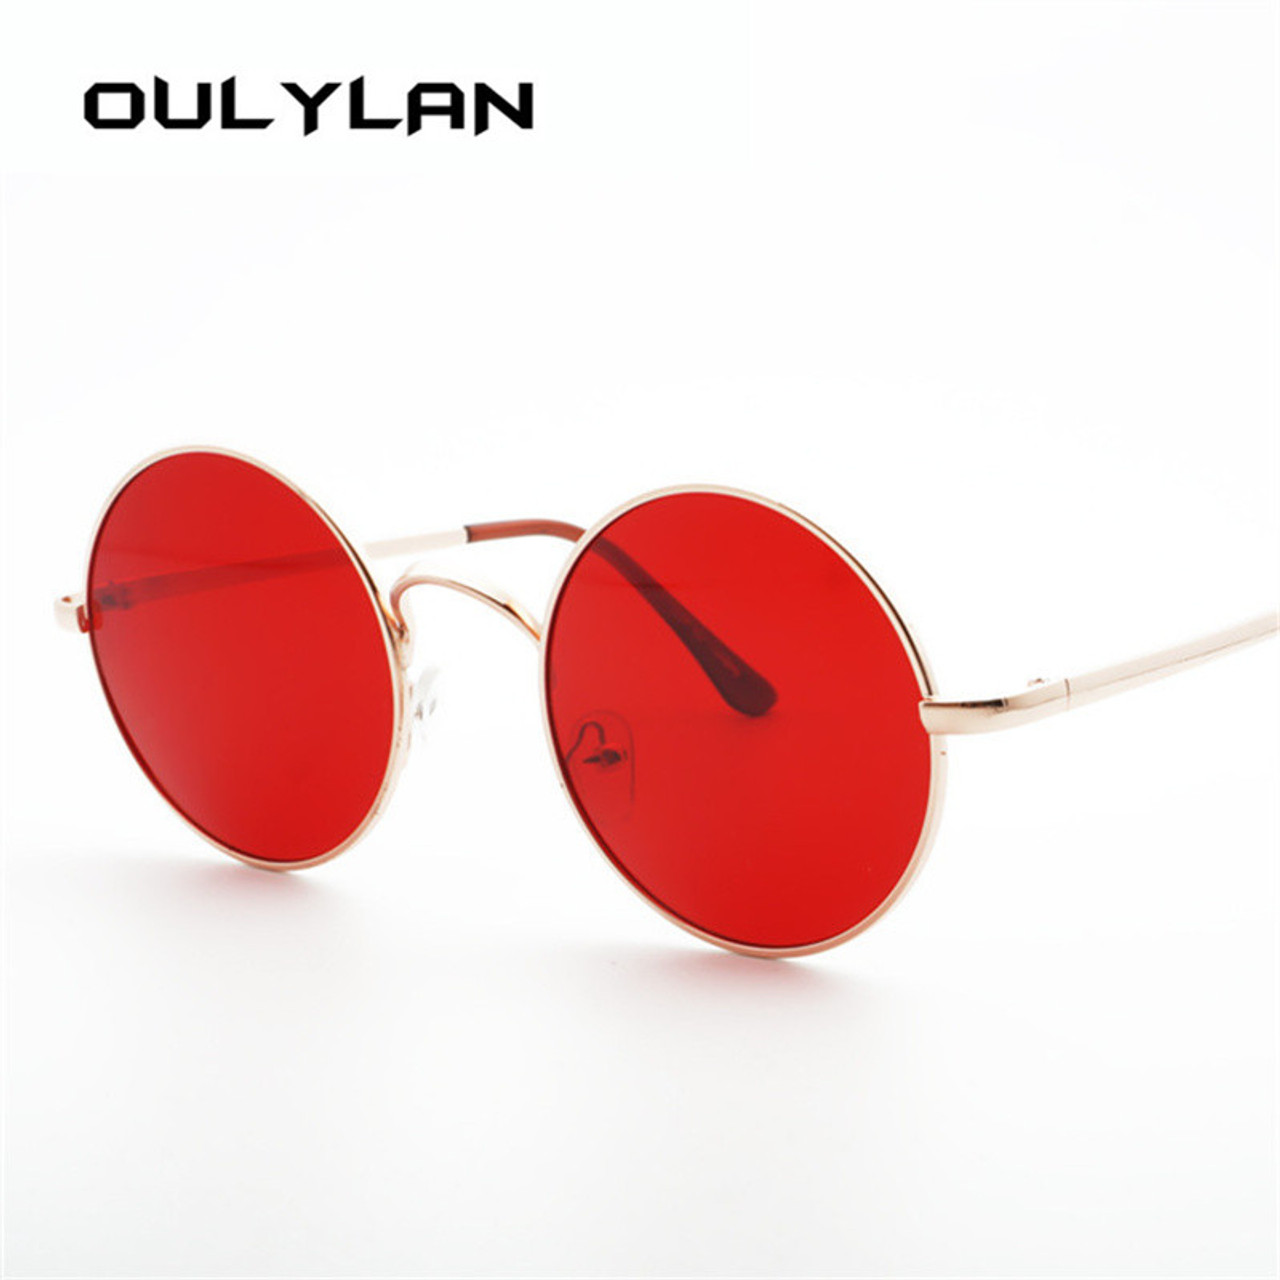 28f1b666f4 Oulylan Retro Round Sunglasses Men Women Brand Designer Red Sun glasses  Female Vintage Metal Big Sunglasses ...